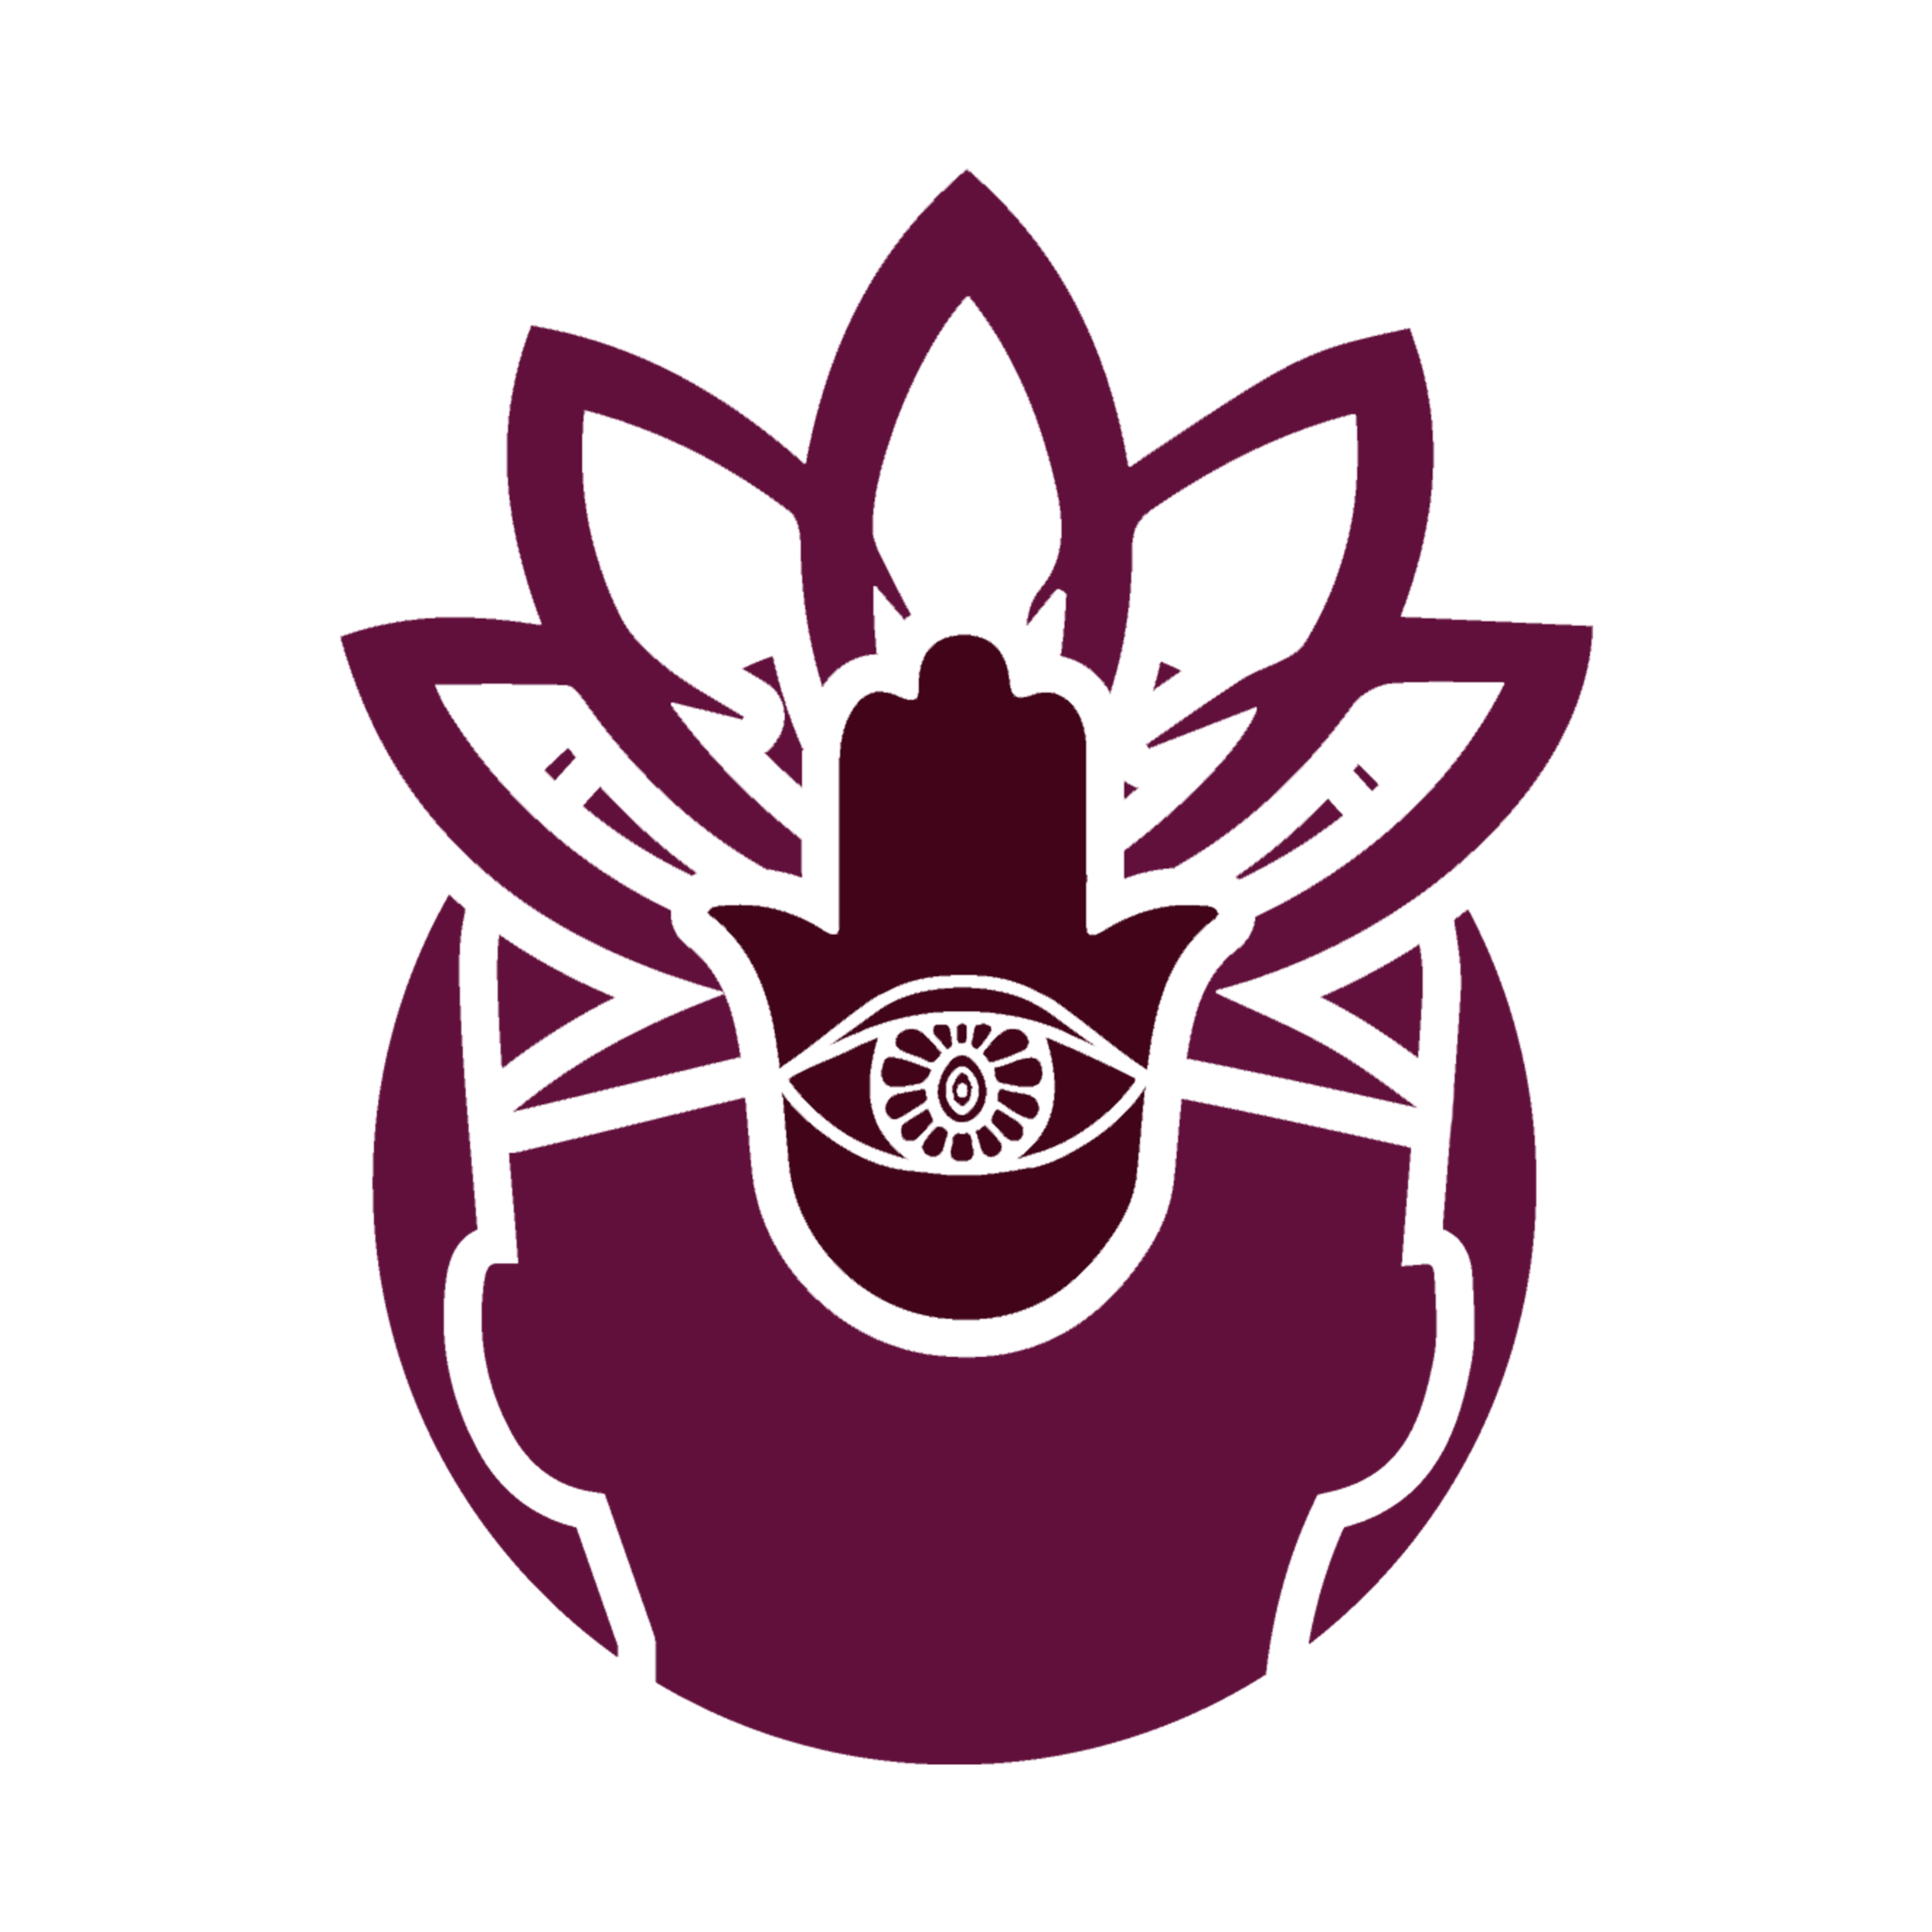 CrownChakraLogo2.png